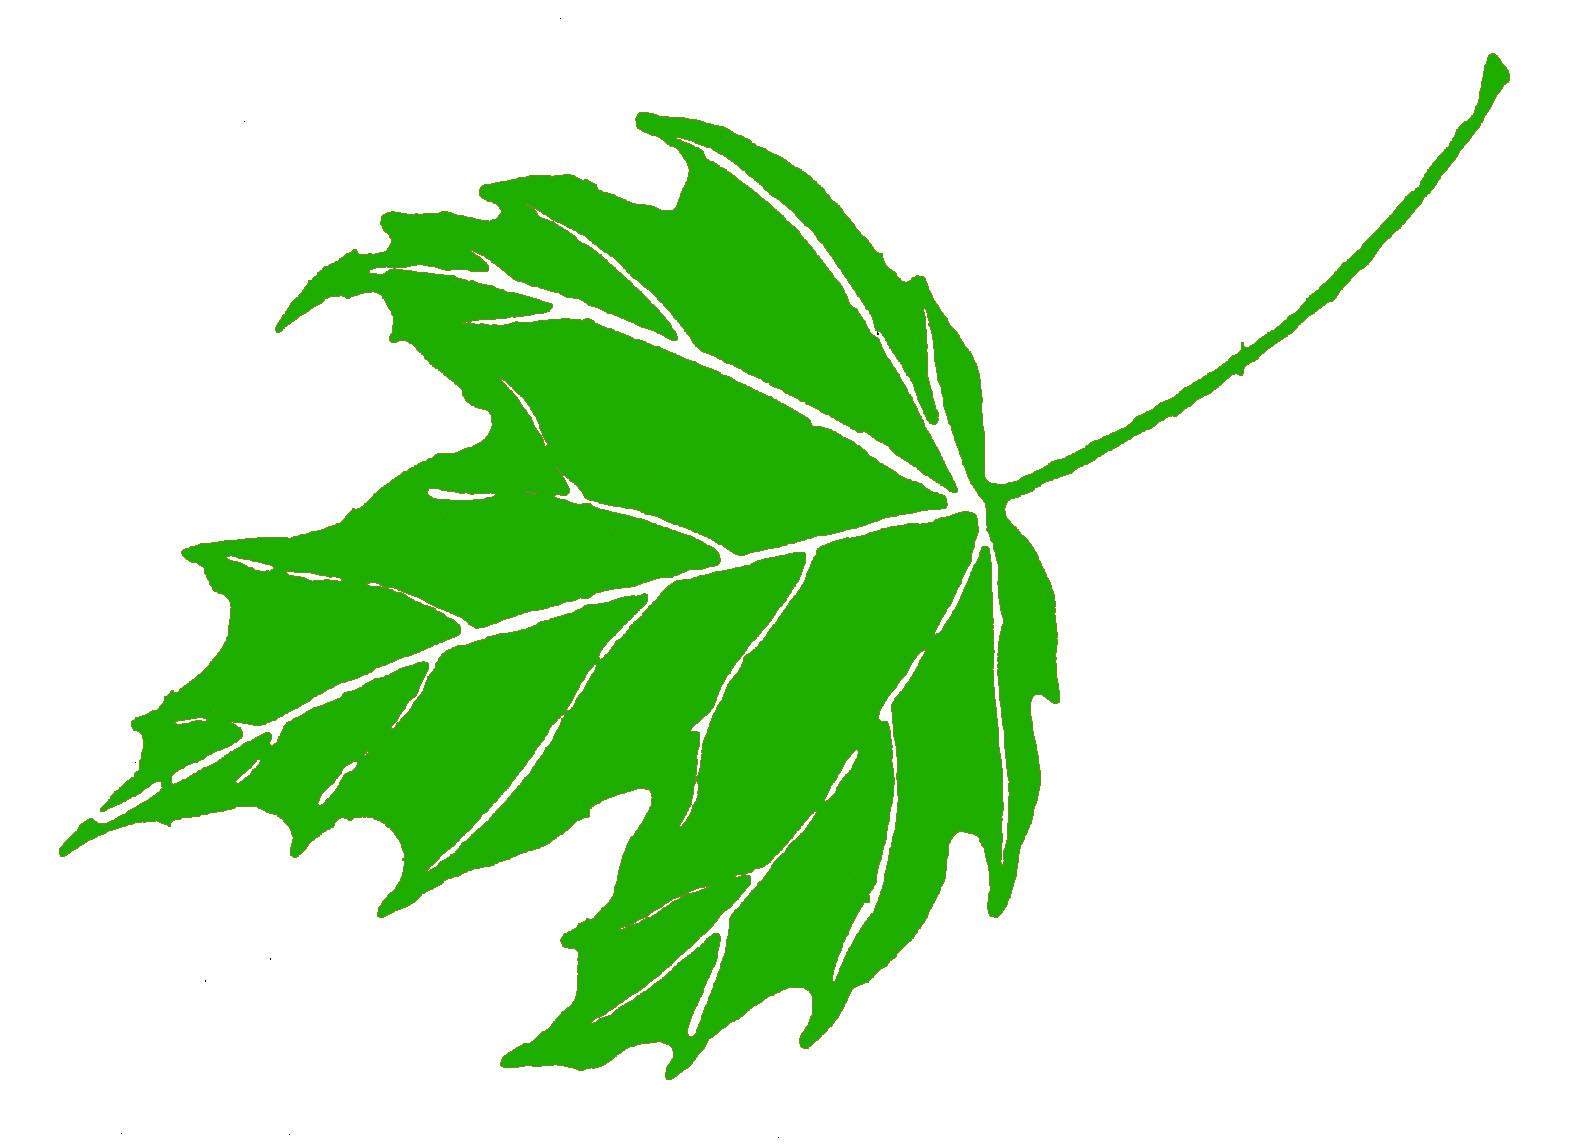 Зеленый лист картинка